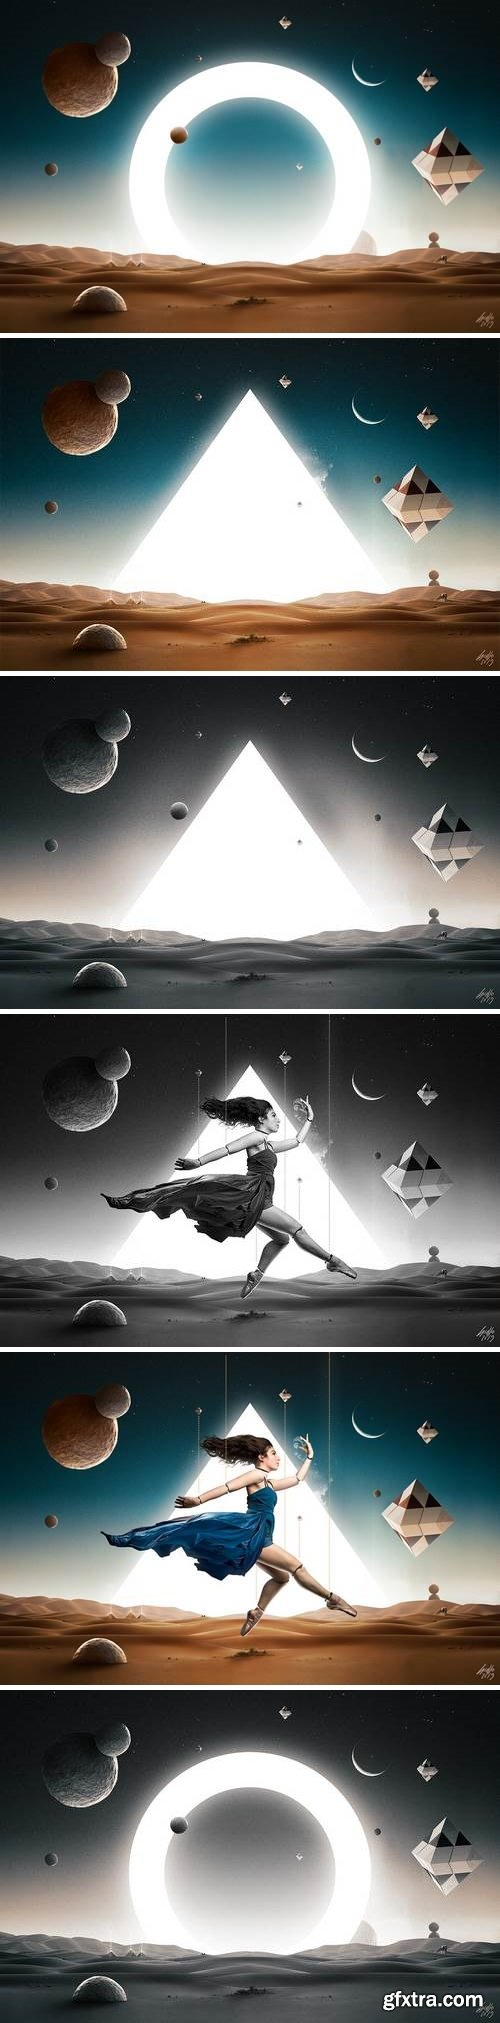 Conceptual HD Wallpapers